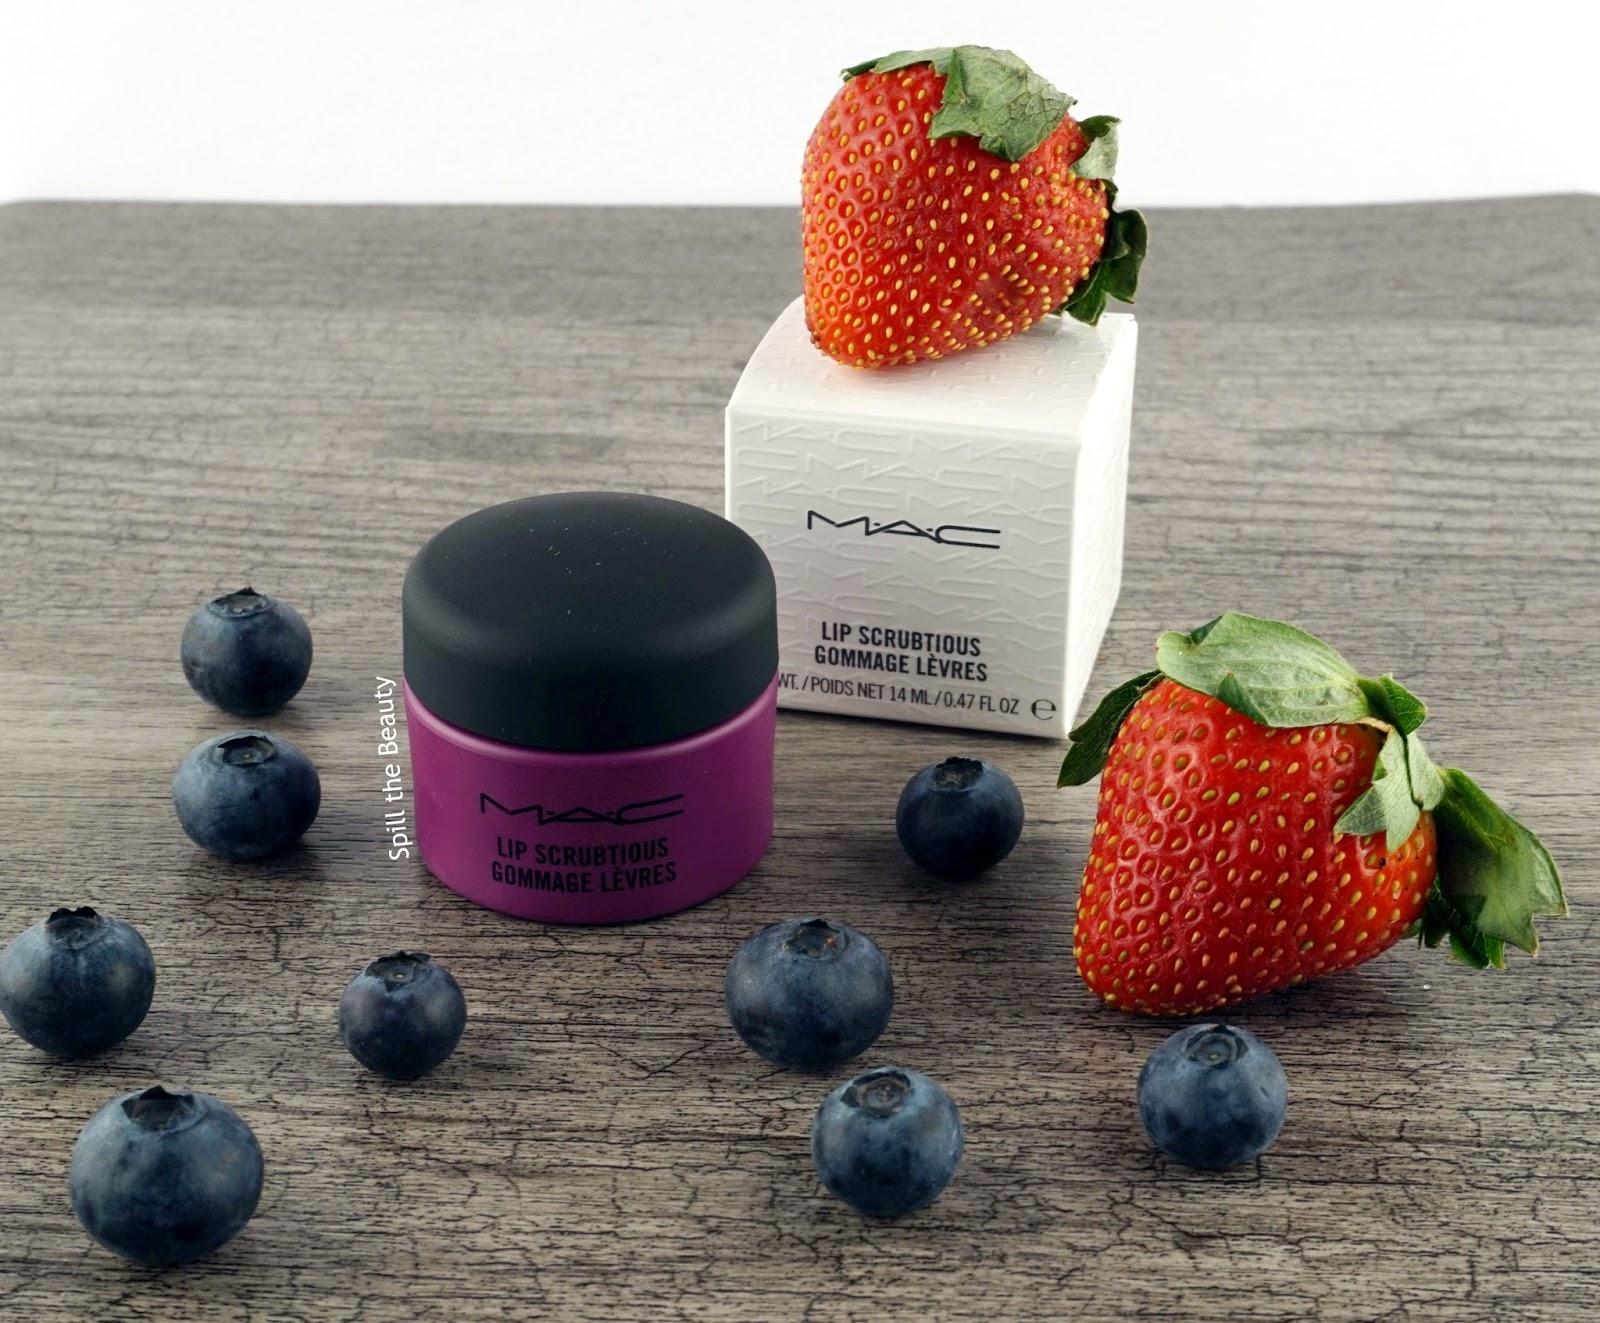 mac lip scrubtious summer berry review